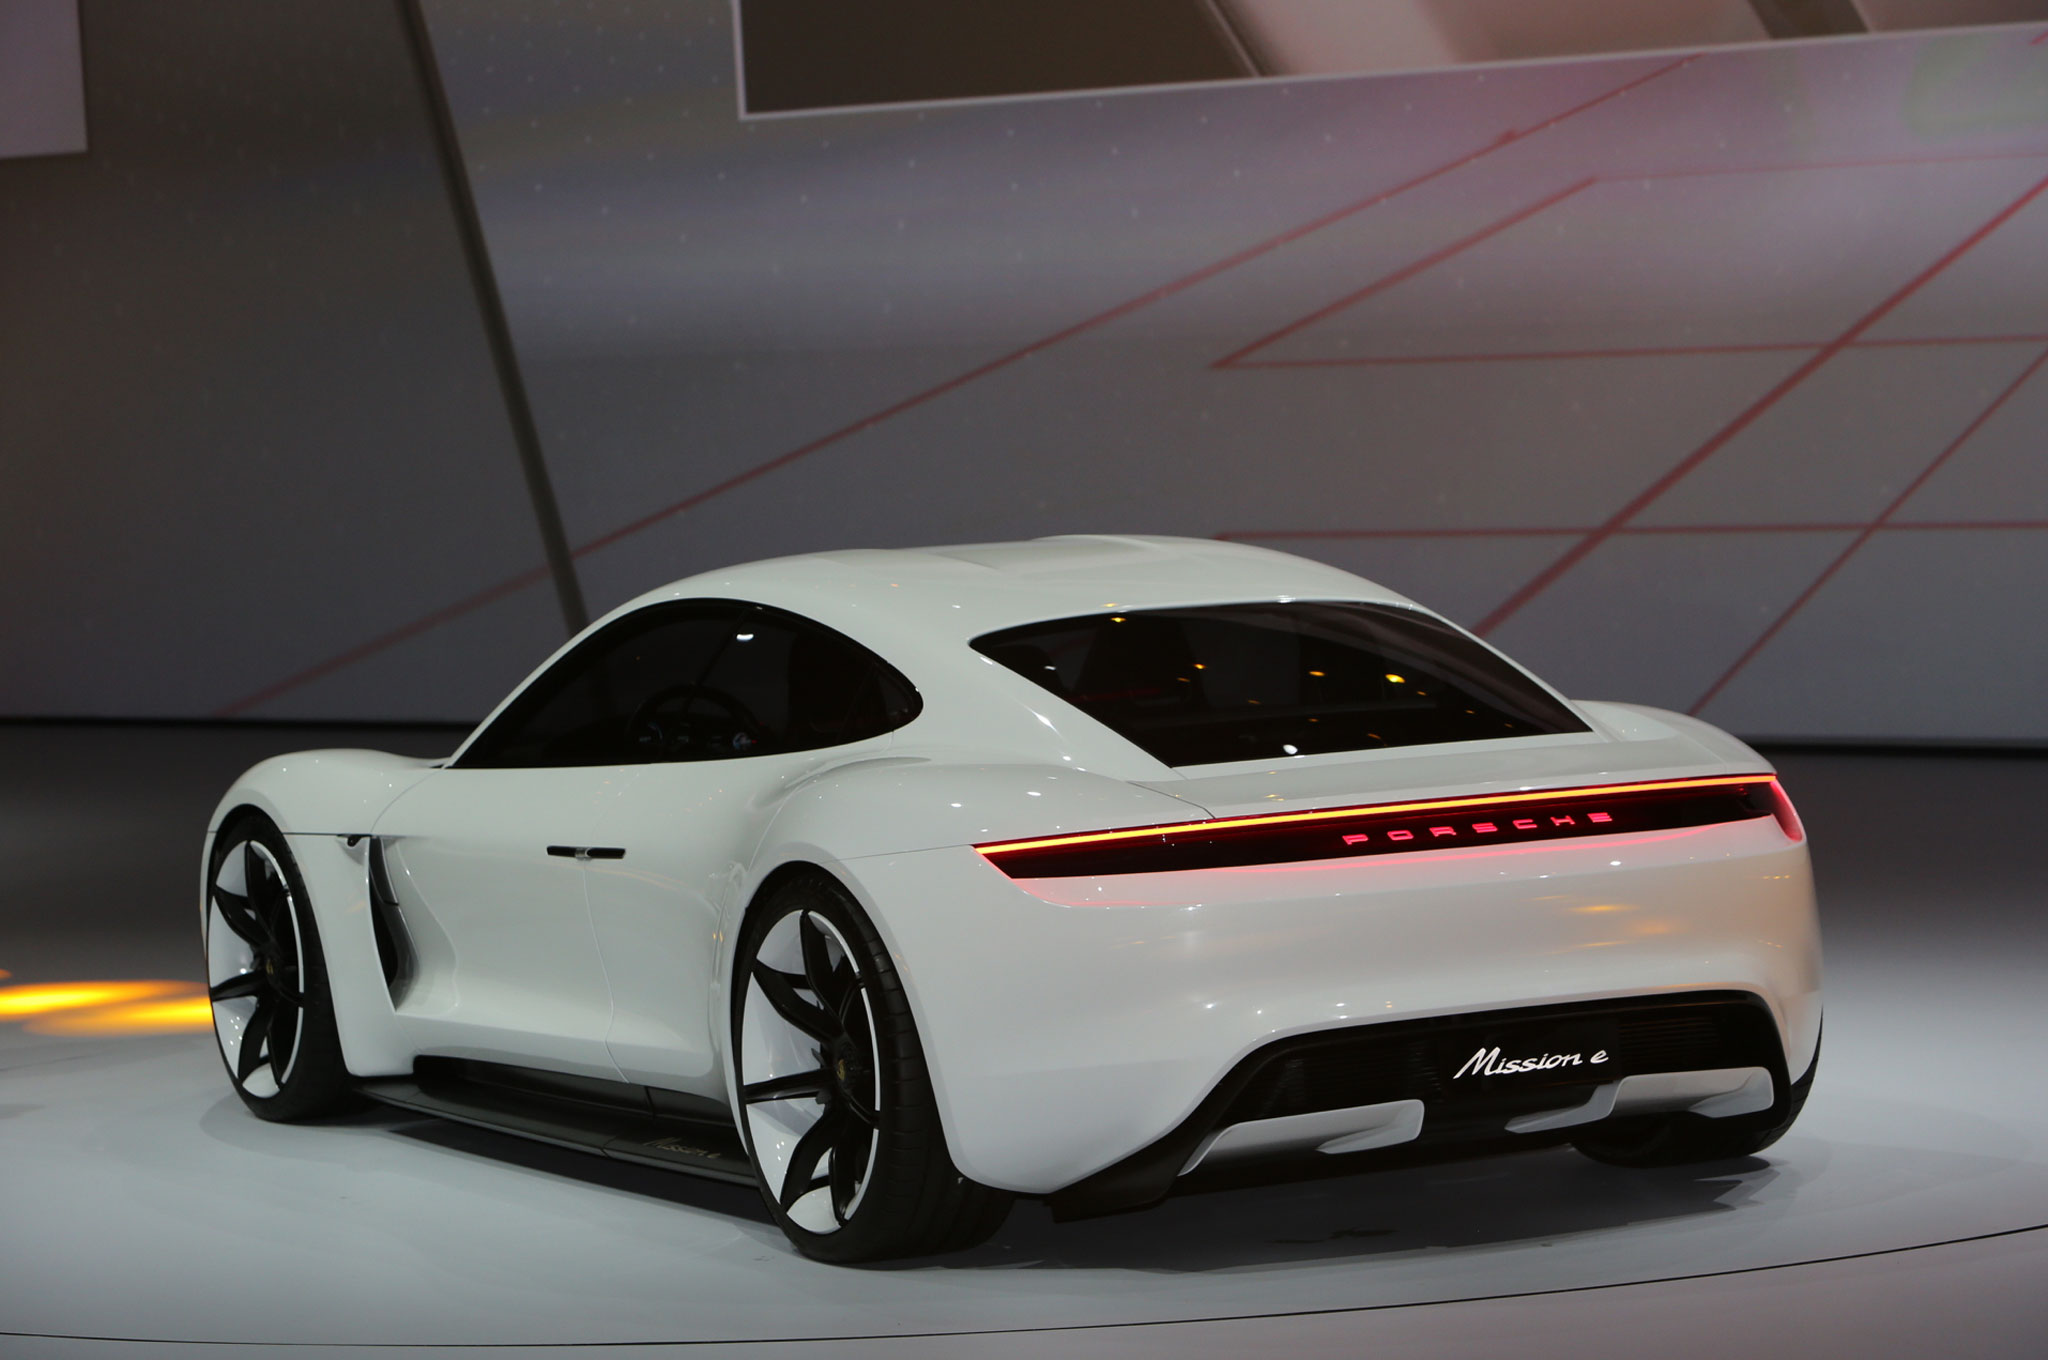 Porsche Panamera Gts 2018 >> Porsche Mission E Concept EV Arrives in Frankfurt with 600 HP